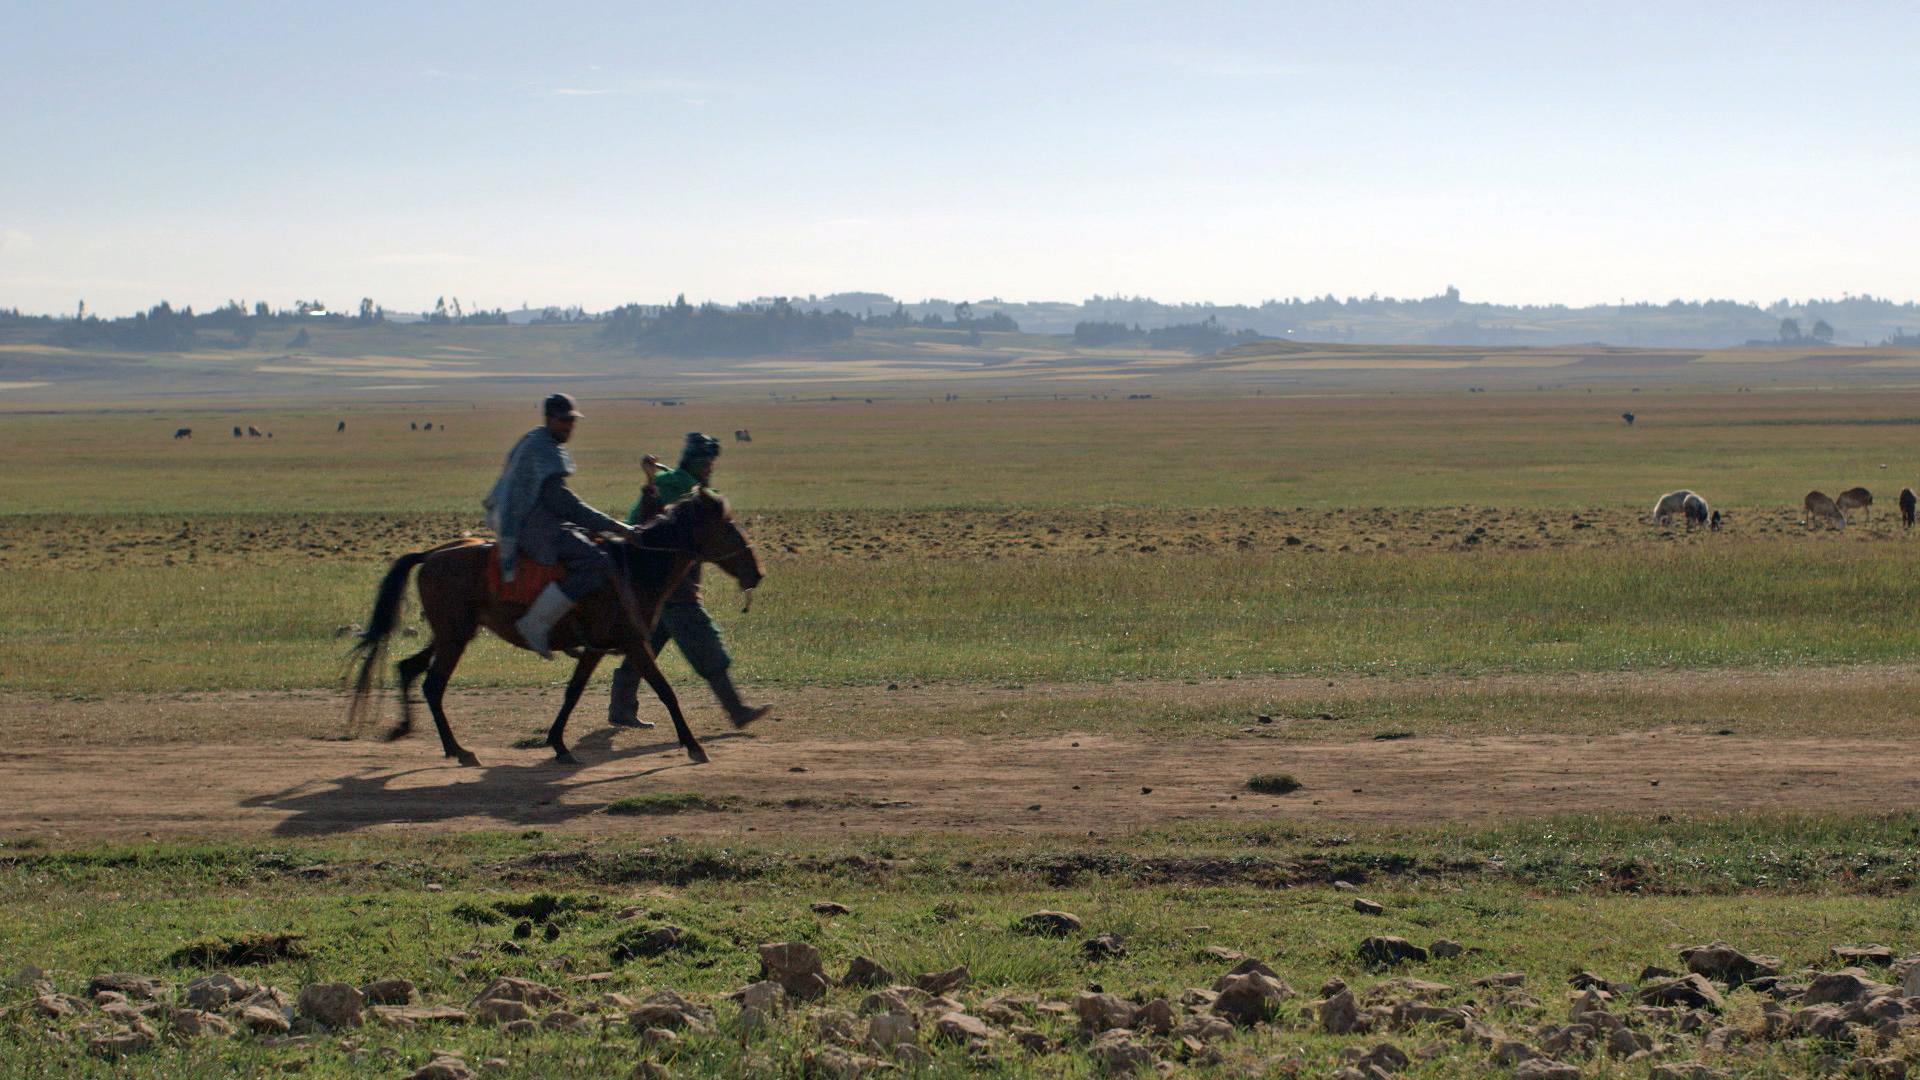 Men on horseback ride across landscape (Photo credit: Max Greenstein / World Vision)